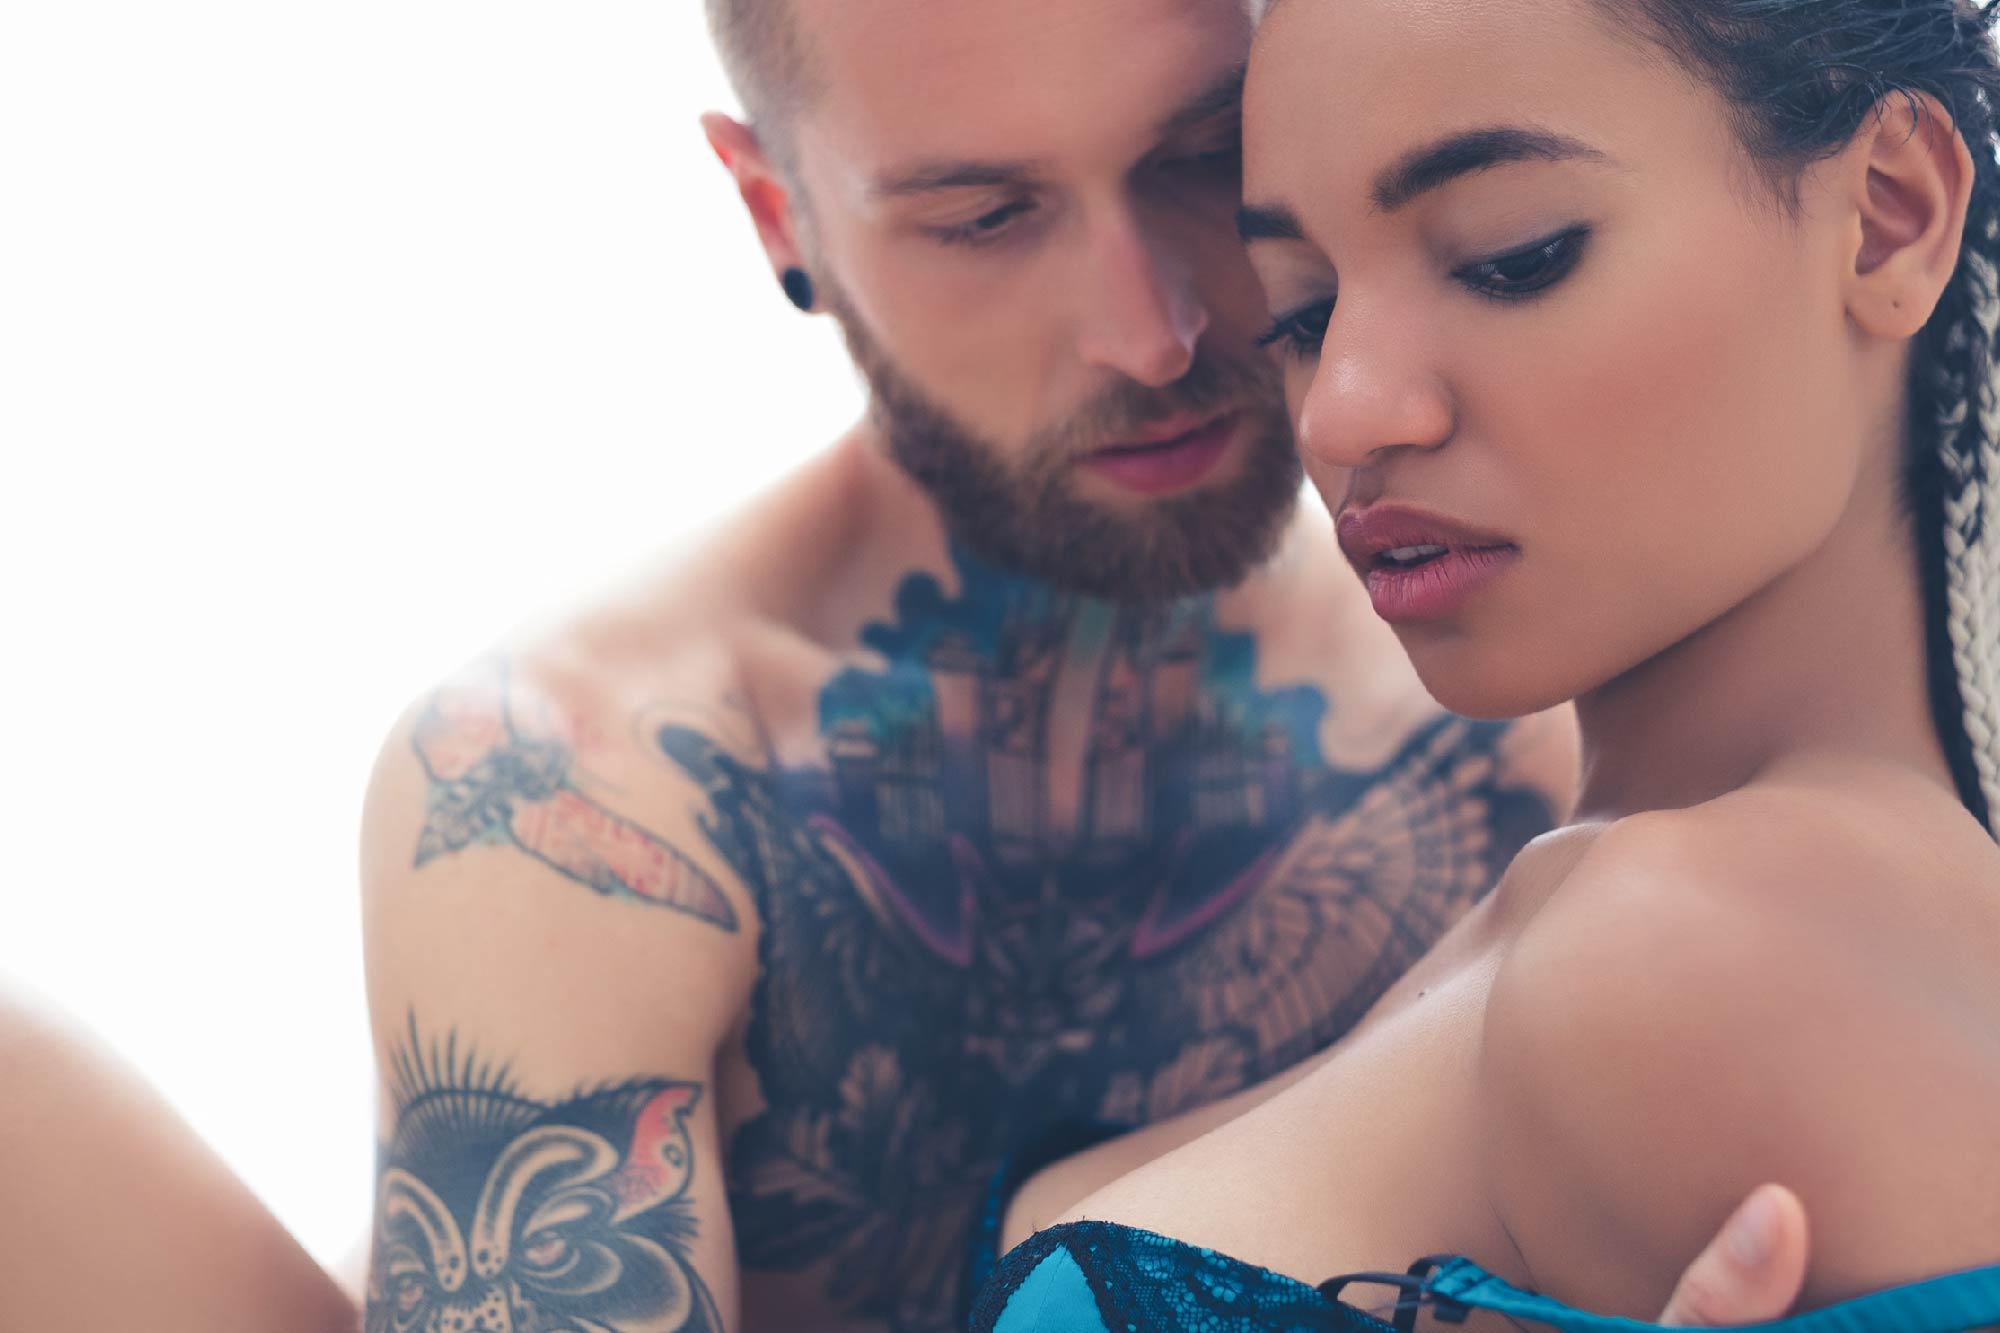 Makeup for London photoshoot. Tattooed man seduces woman (1).